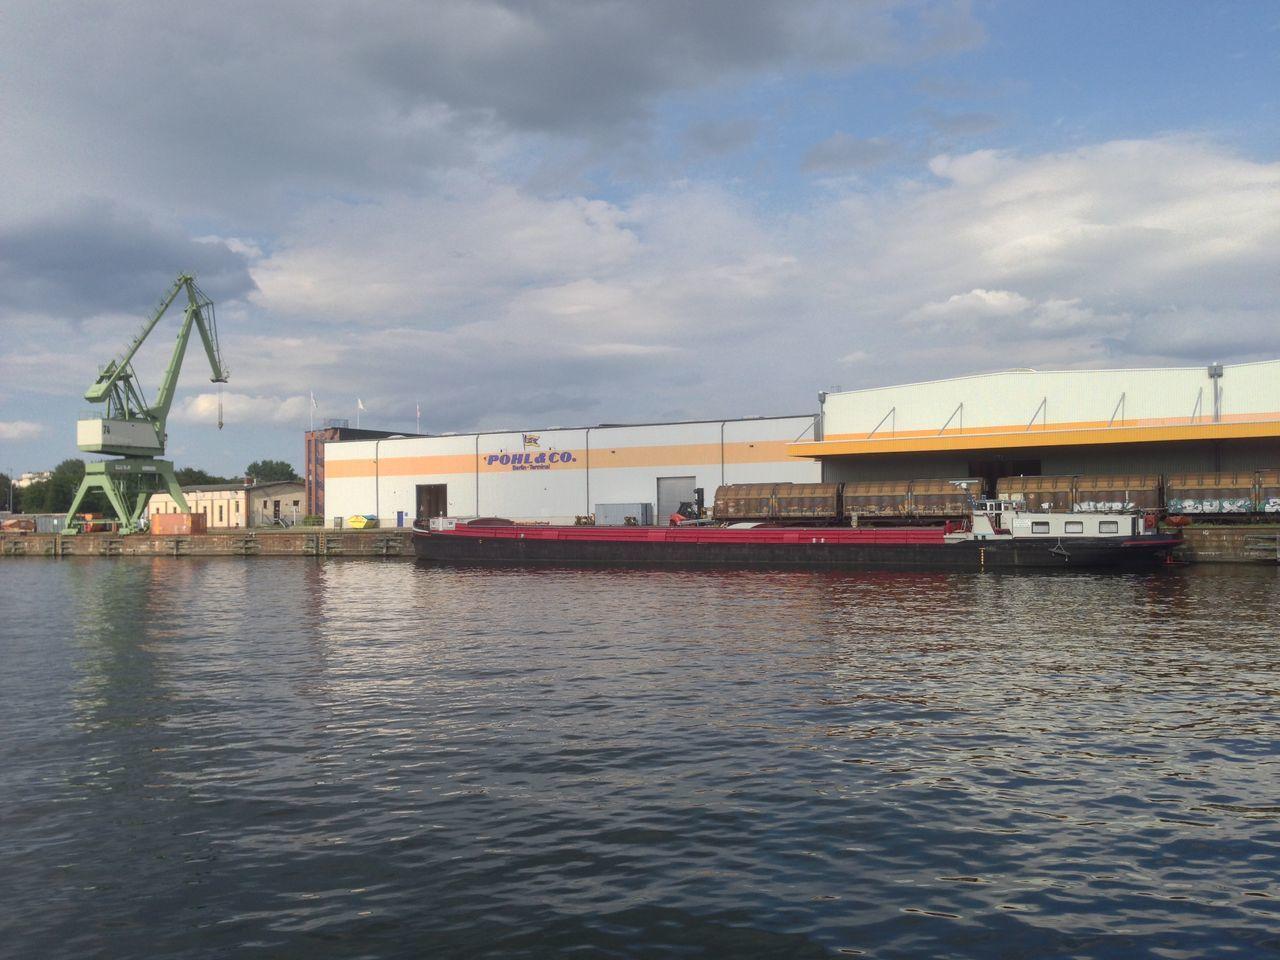 Crane Harbour Warehouse Boat Goods